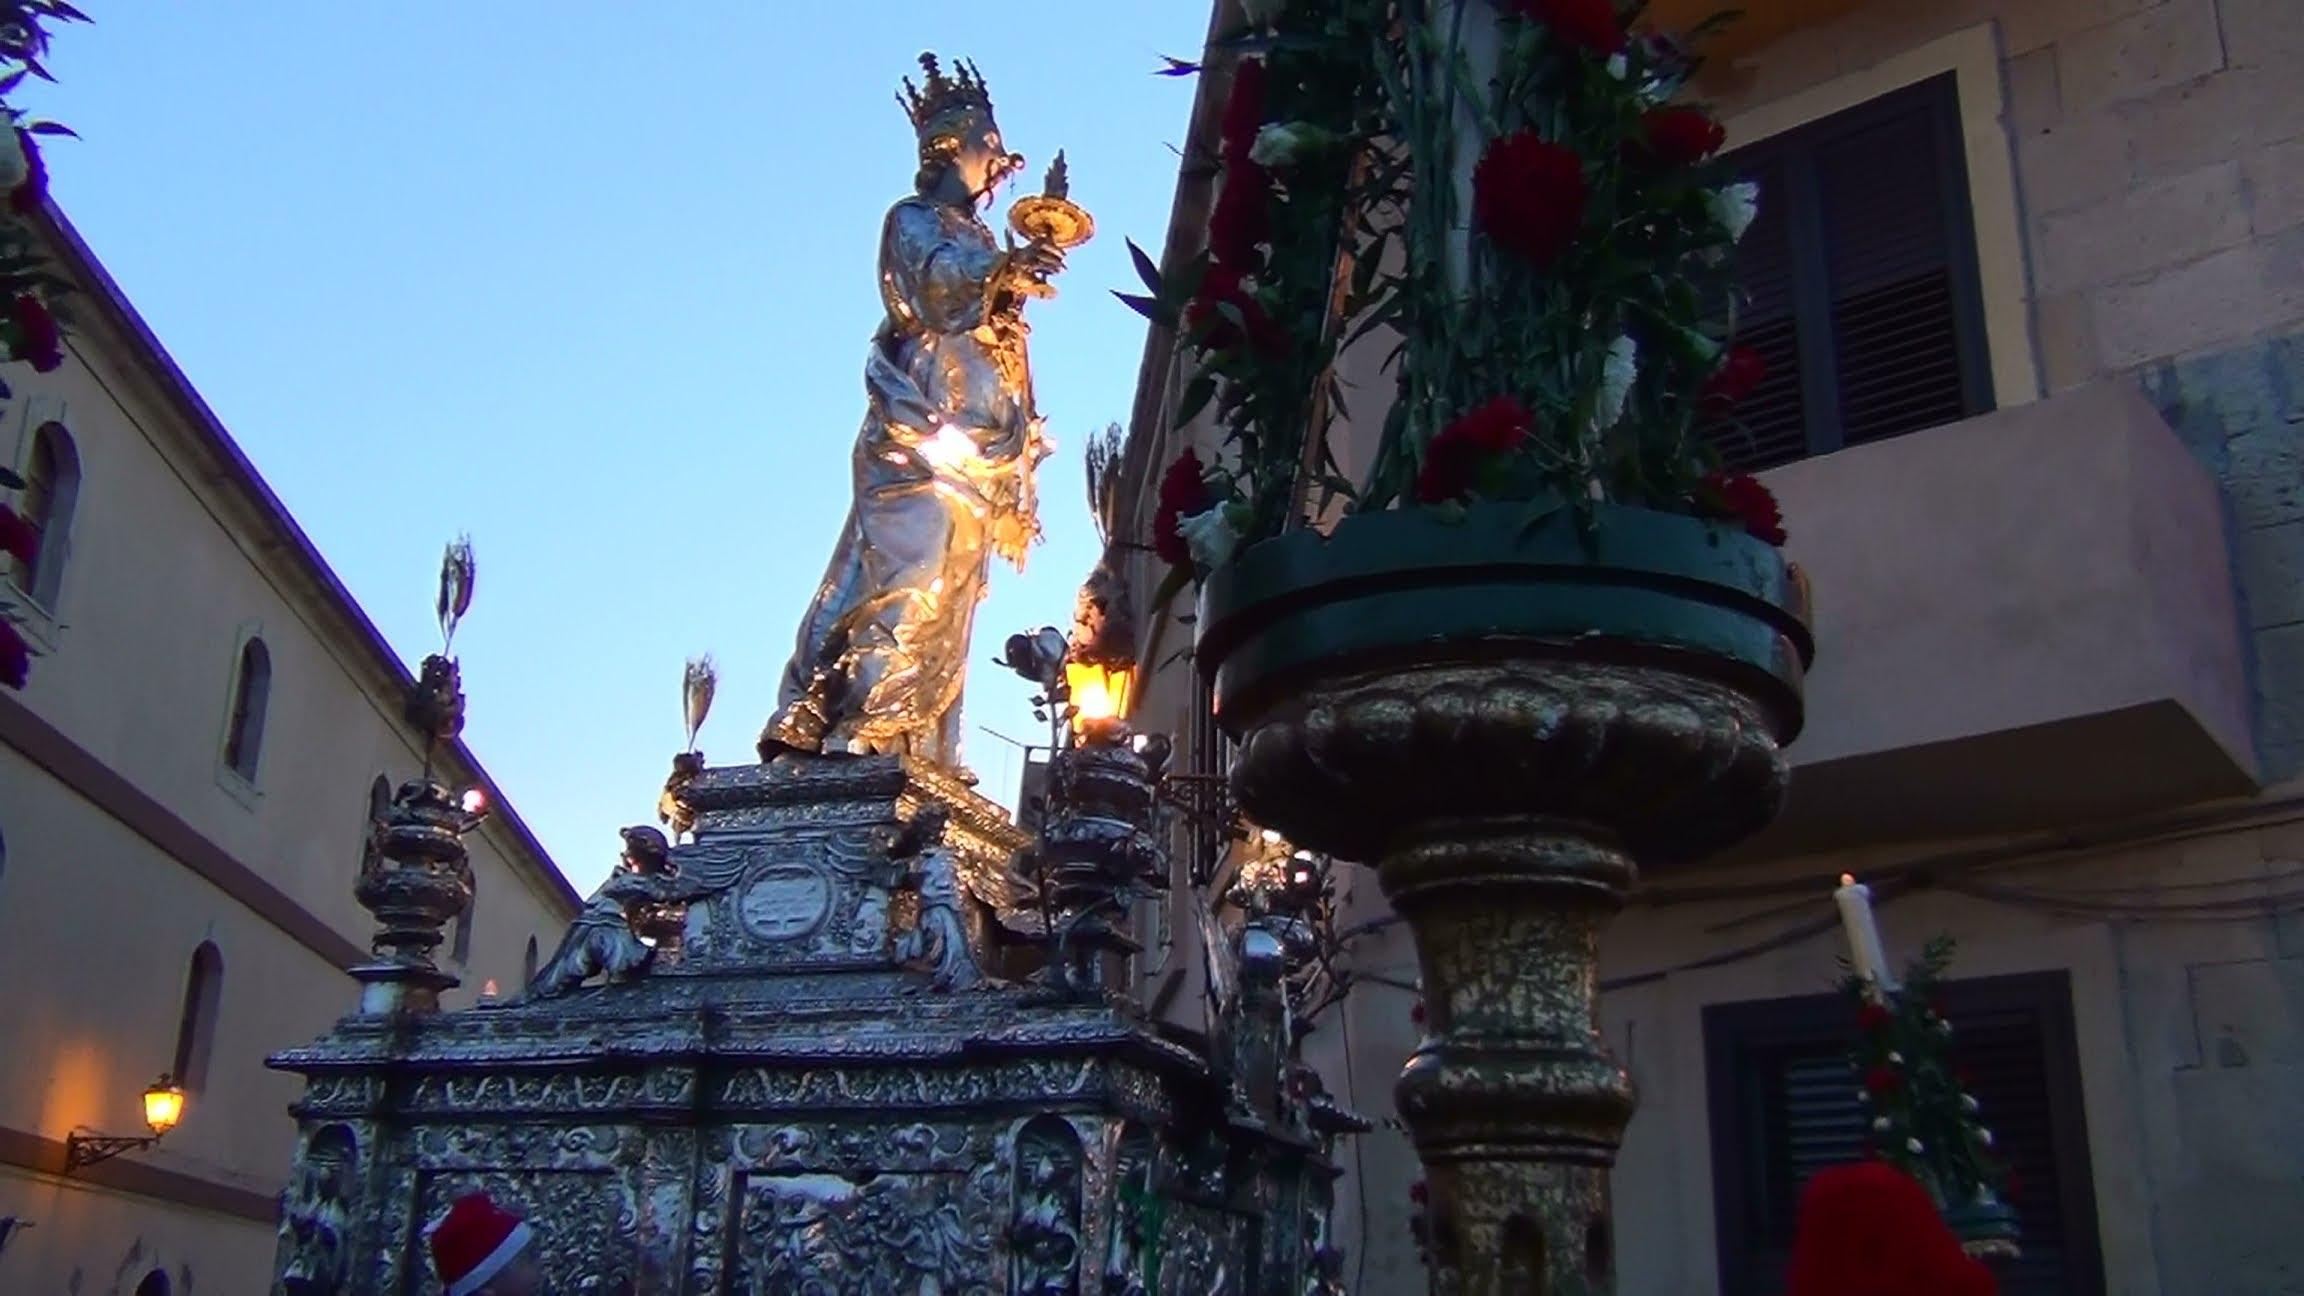 Santa Lucia festeggia la sua patrona